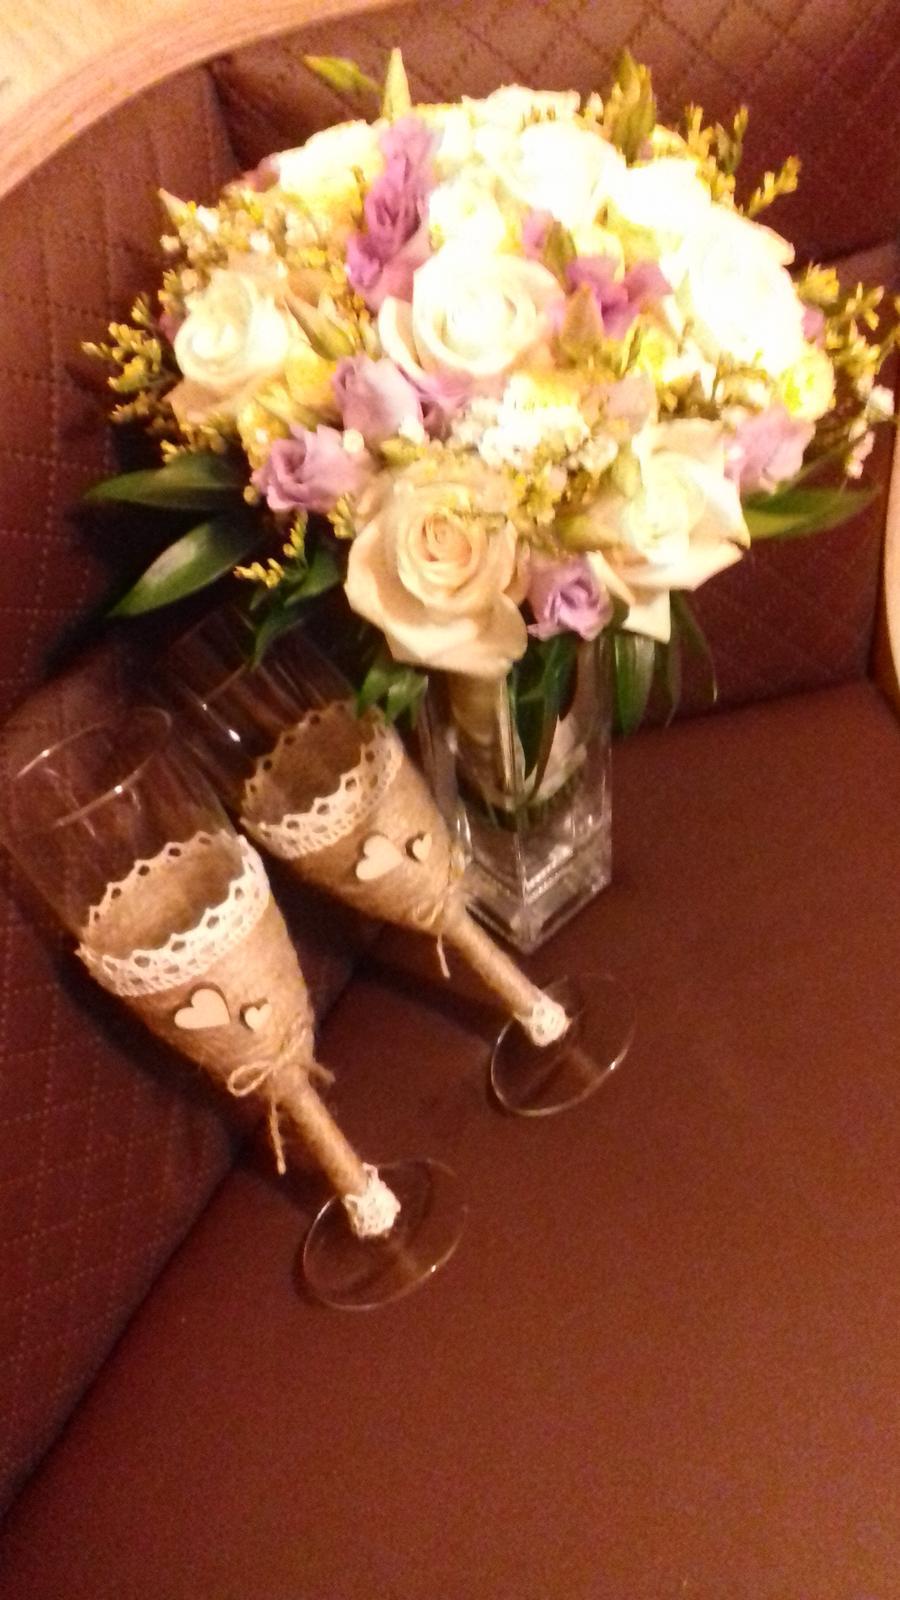 Svadobné poháre  - Obrázok č. 3